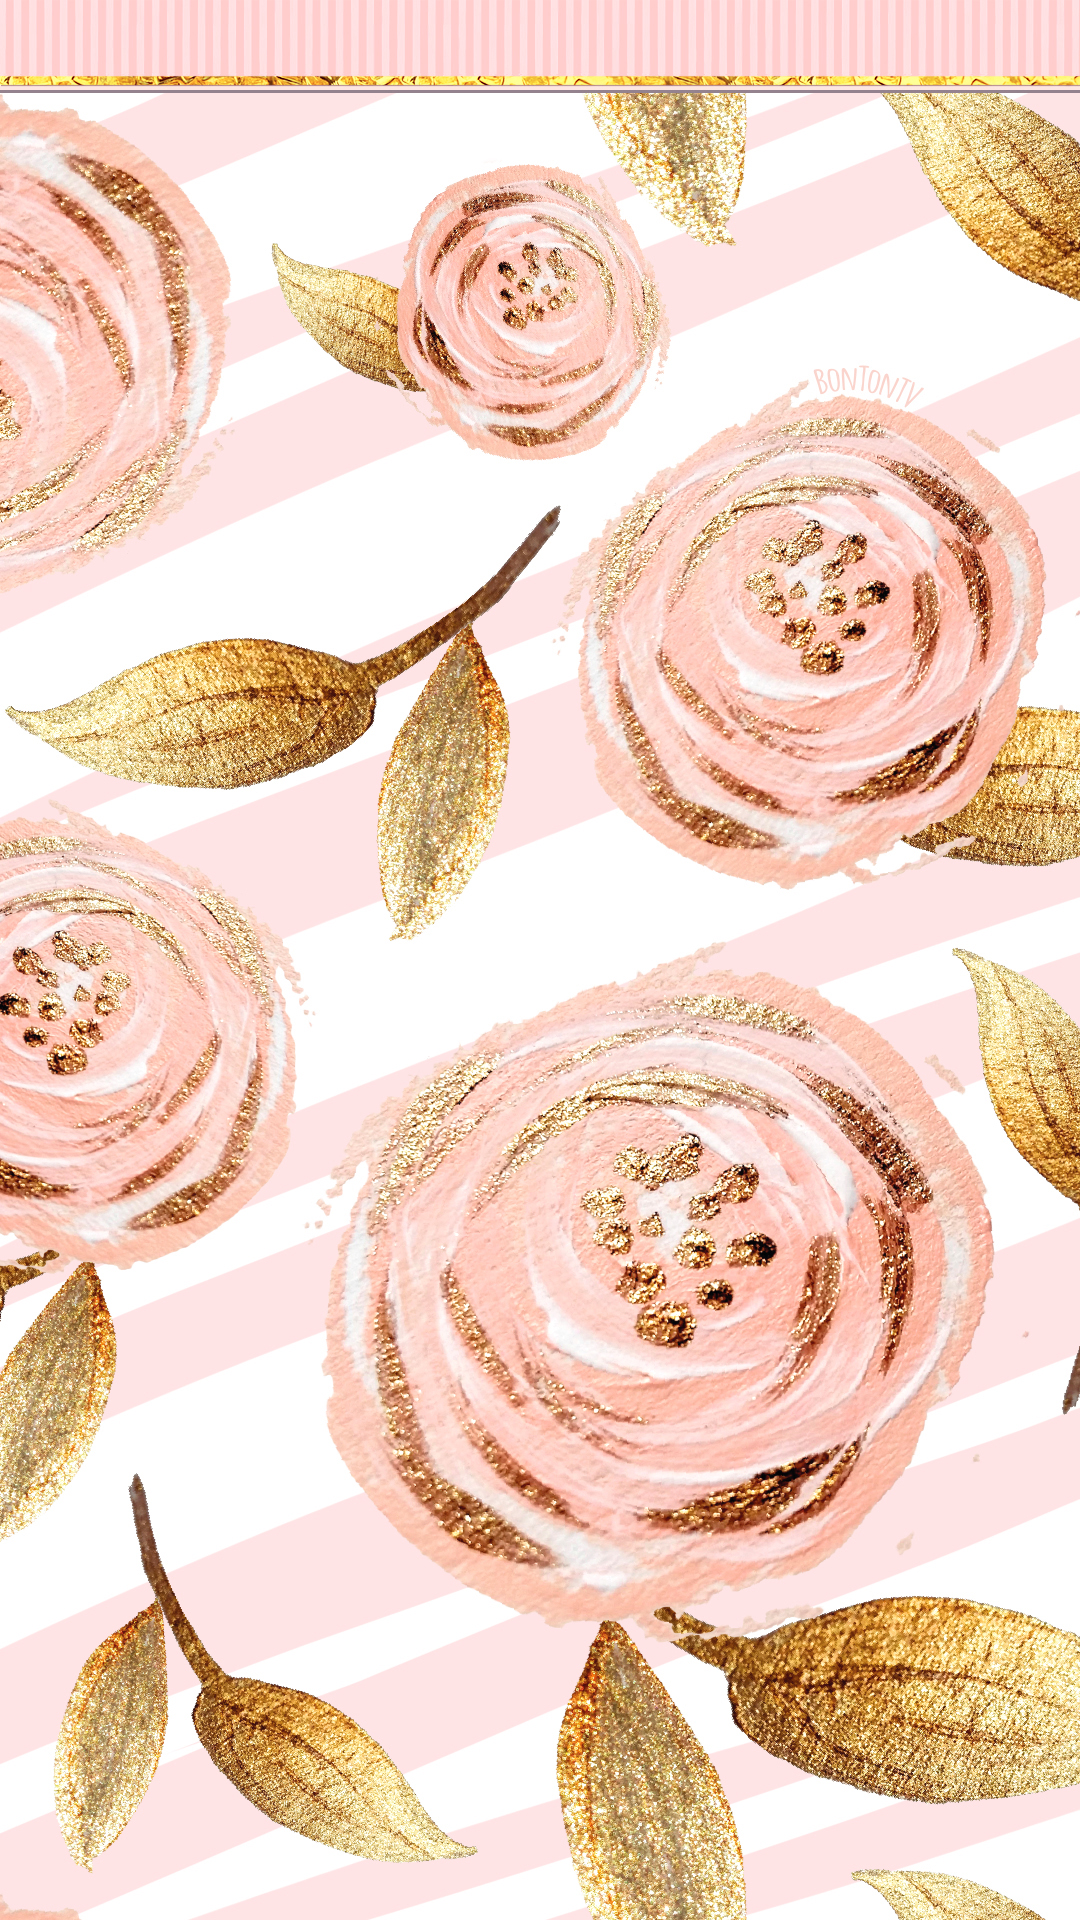 Gold Roses Cartoon Wallpapers - Wallpaper Cave